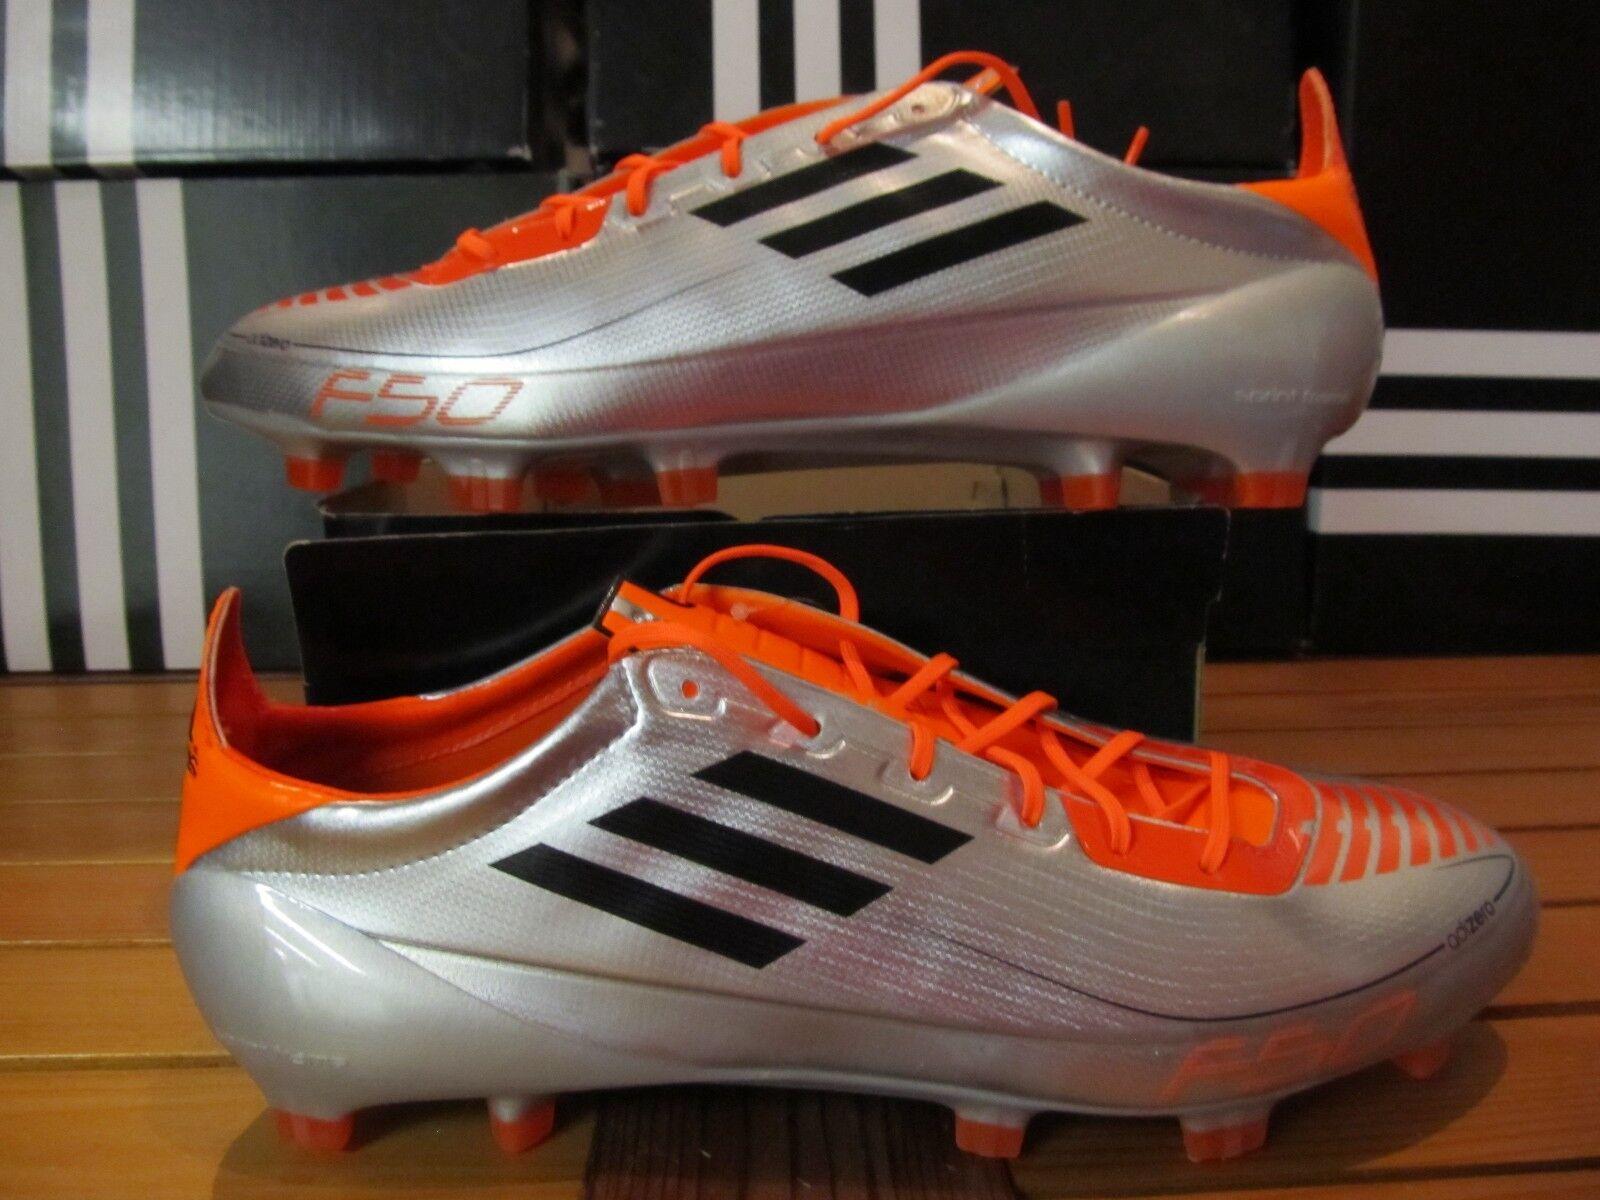 Ds Adidas F50 Adizero TRX Fg Plata Naranja 12 G43961 Fútbol Tacos Messi Mania